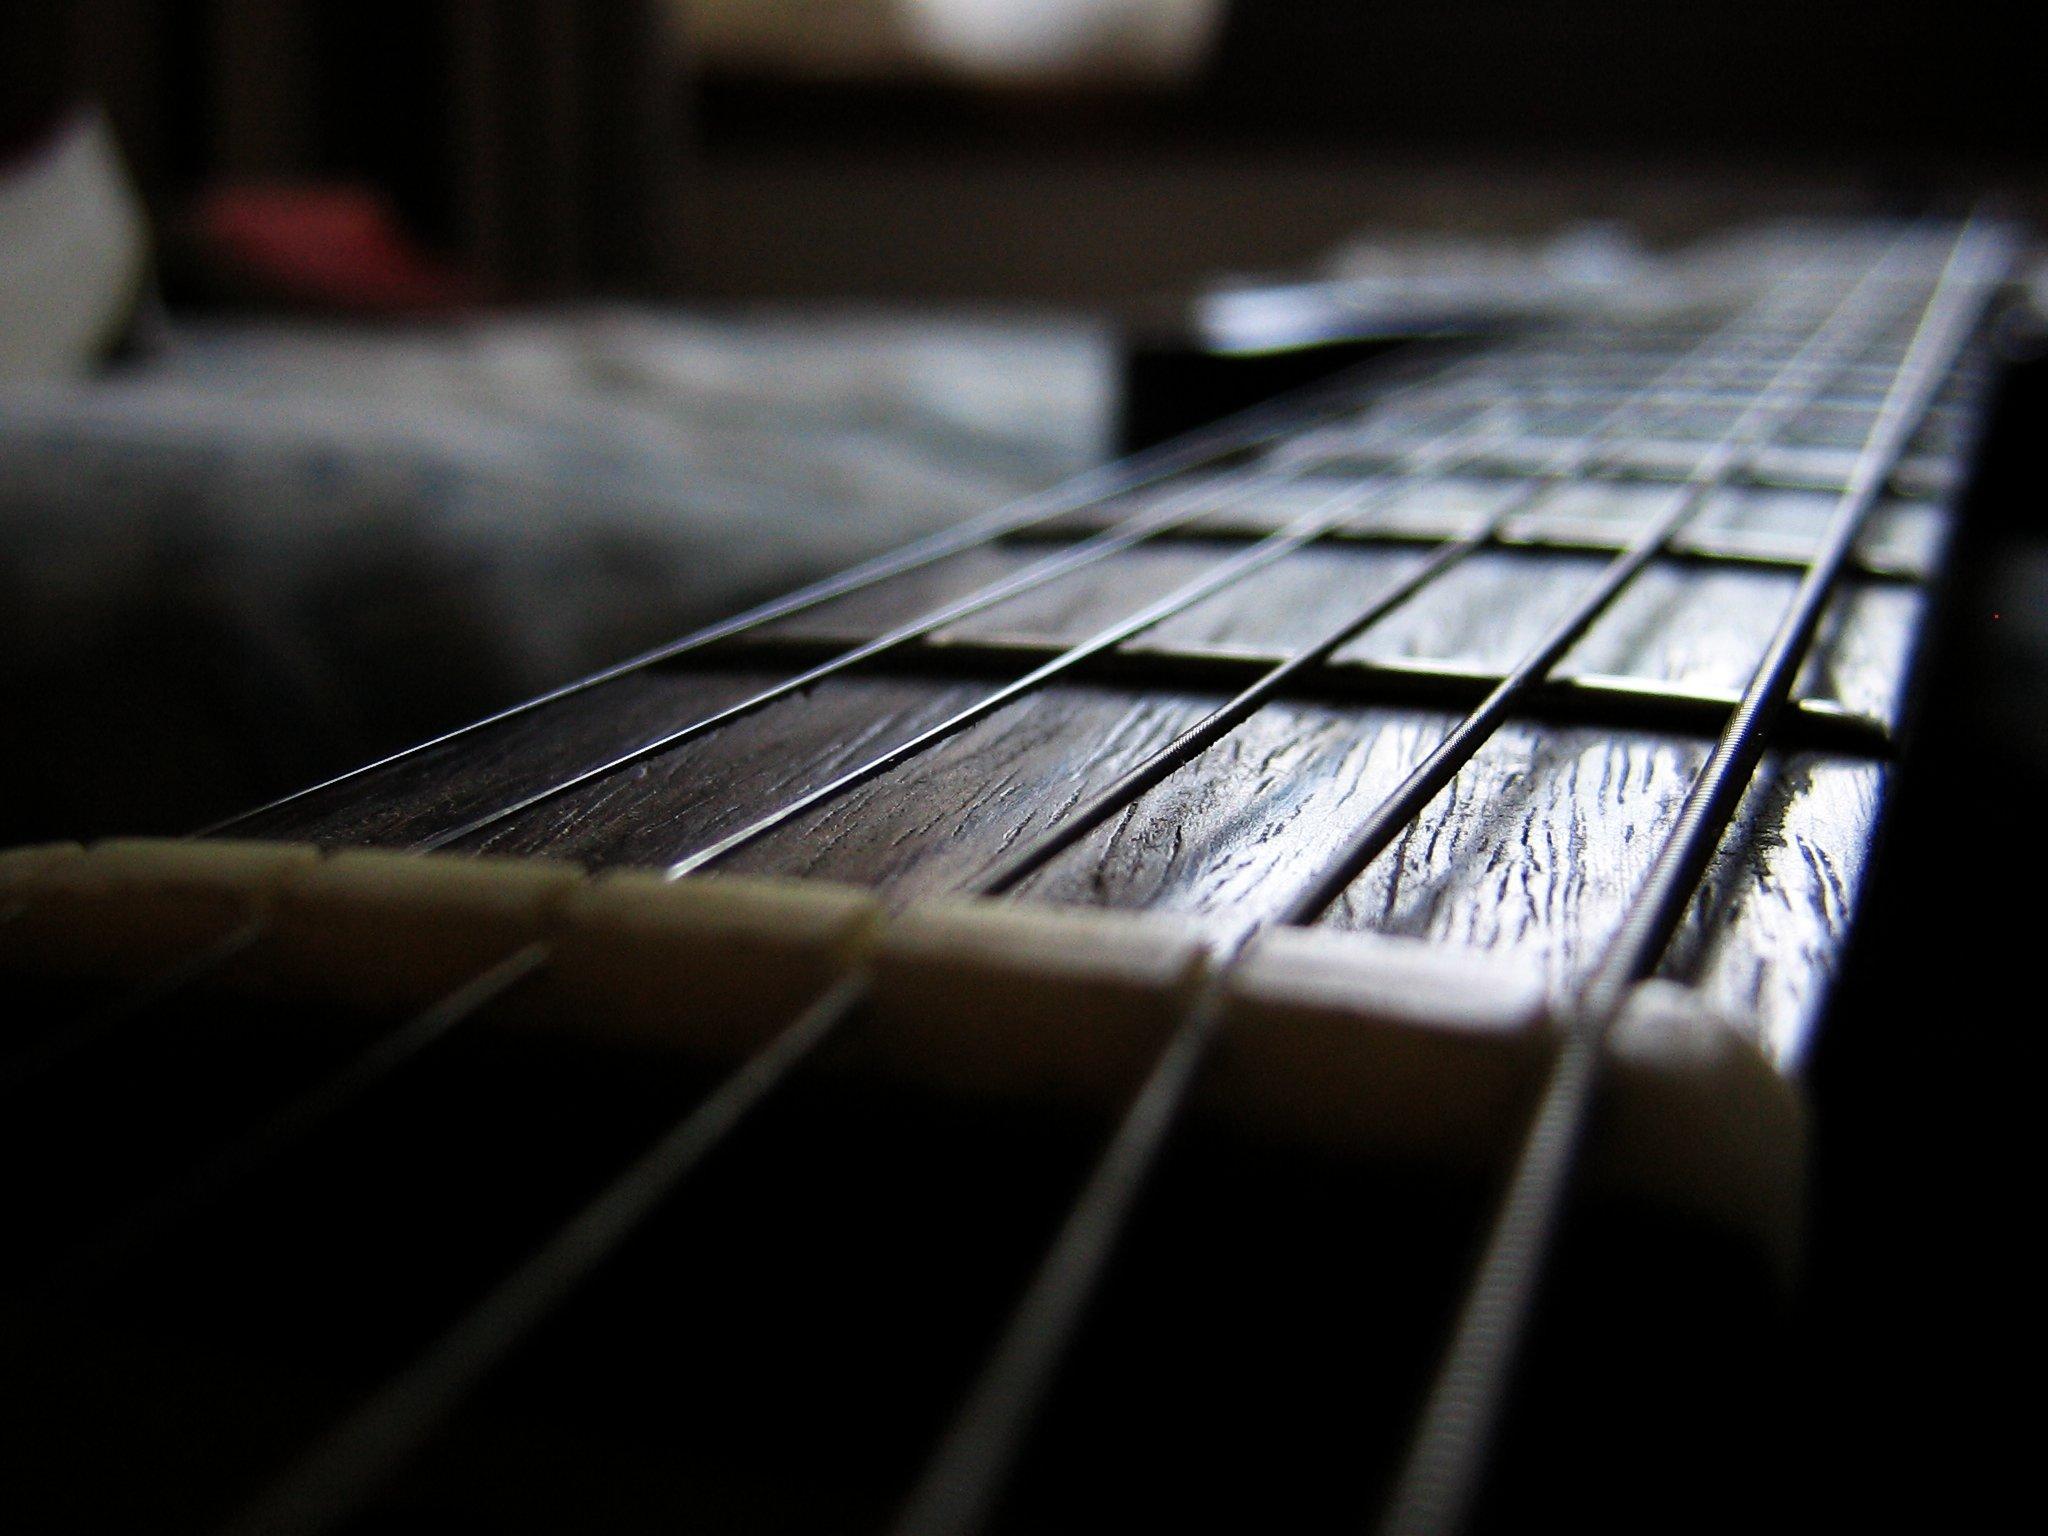 My guitar at evening  by  Mattia Belletti ,  Attribution 2.0 Generic